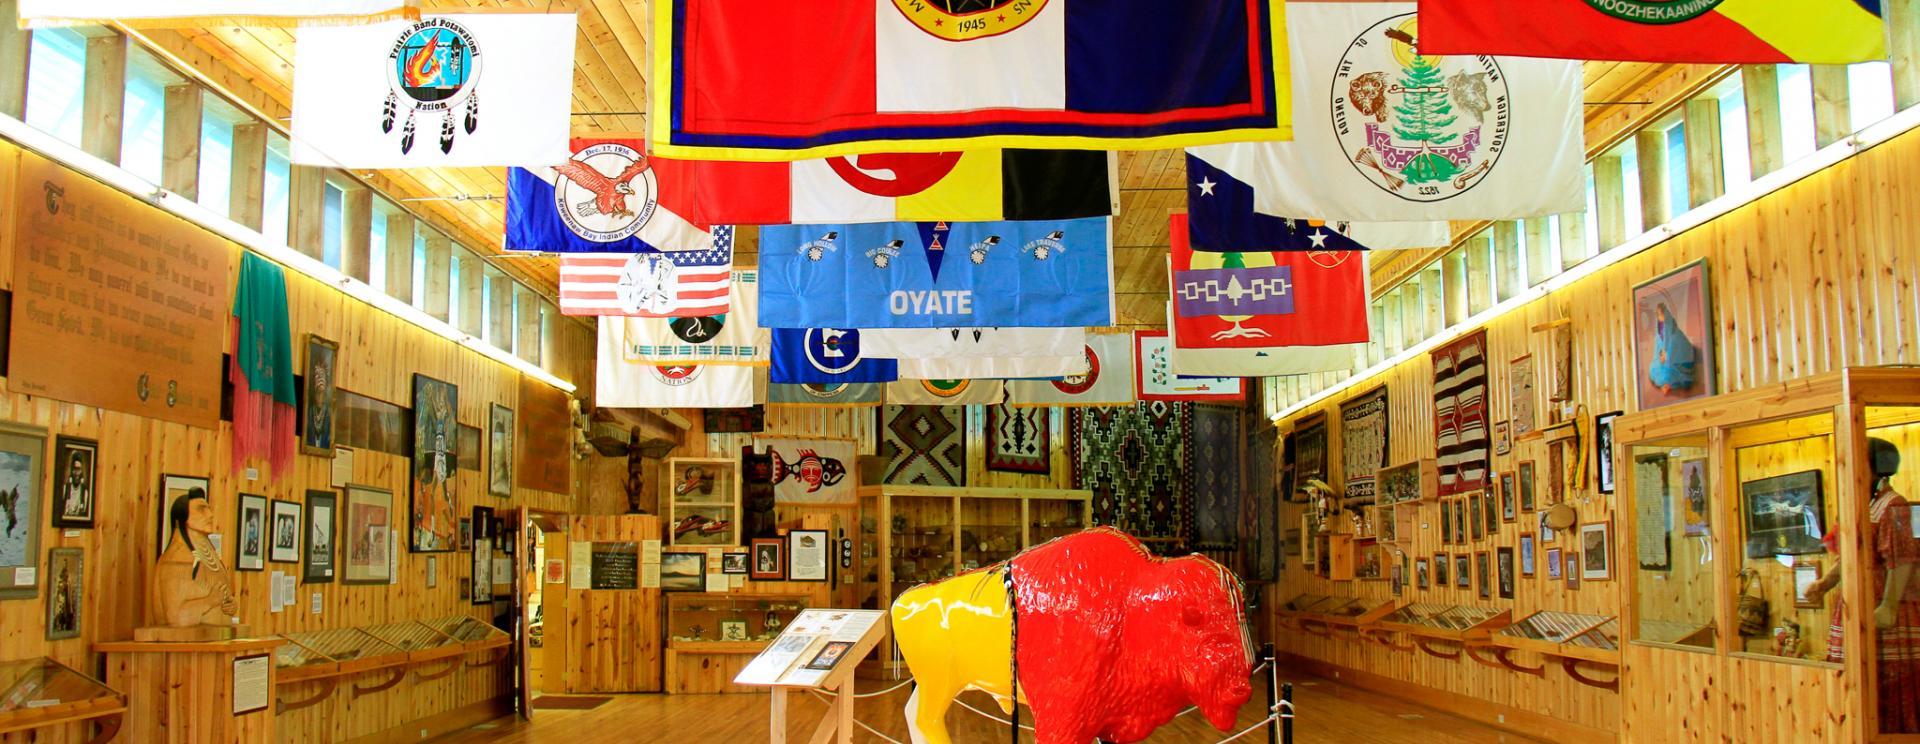 Crazy Horse Orientation & Communications Center